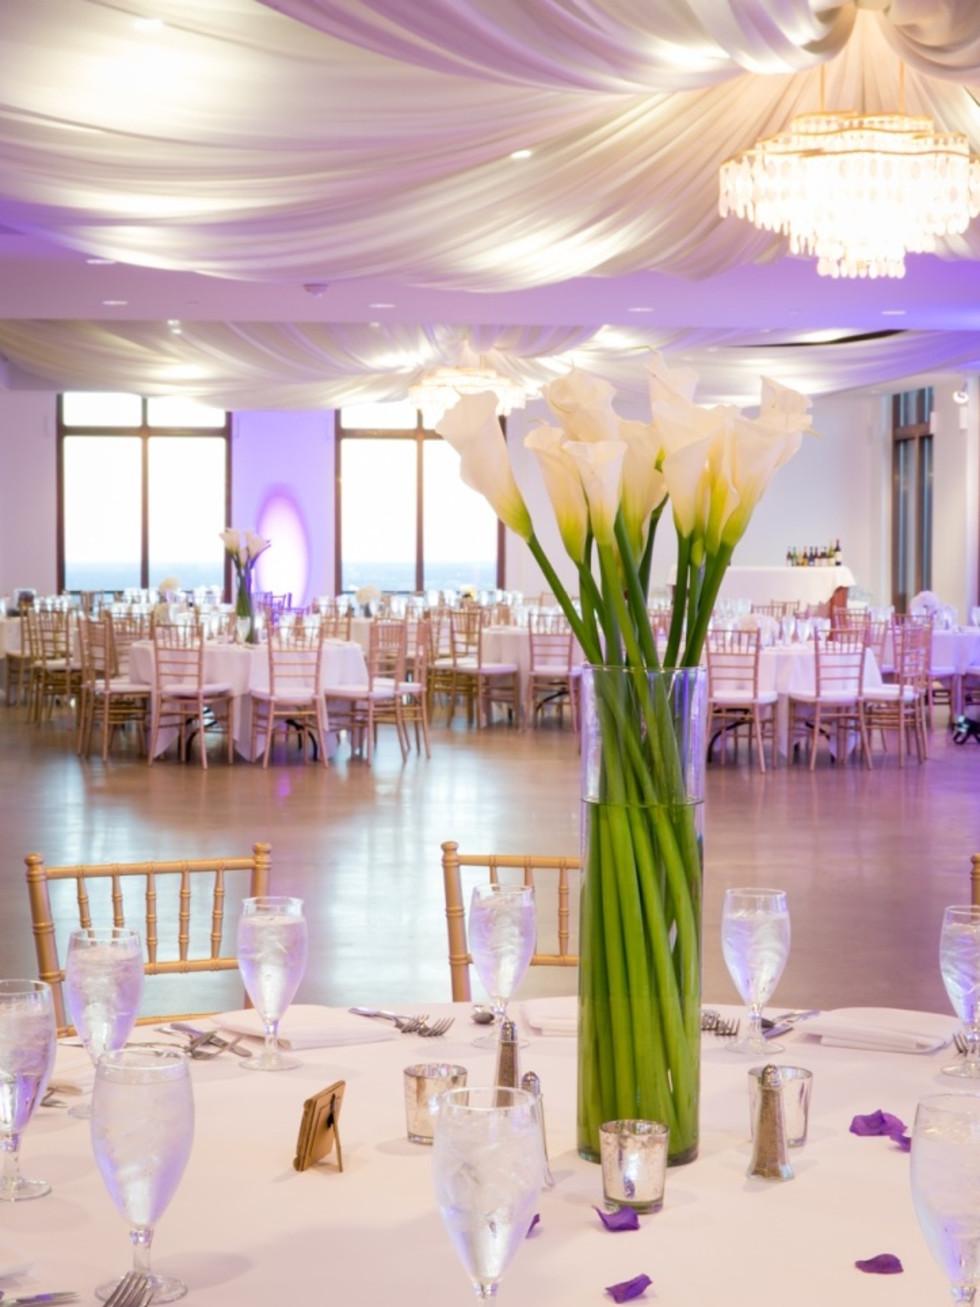 Upshaw wedding, tables